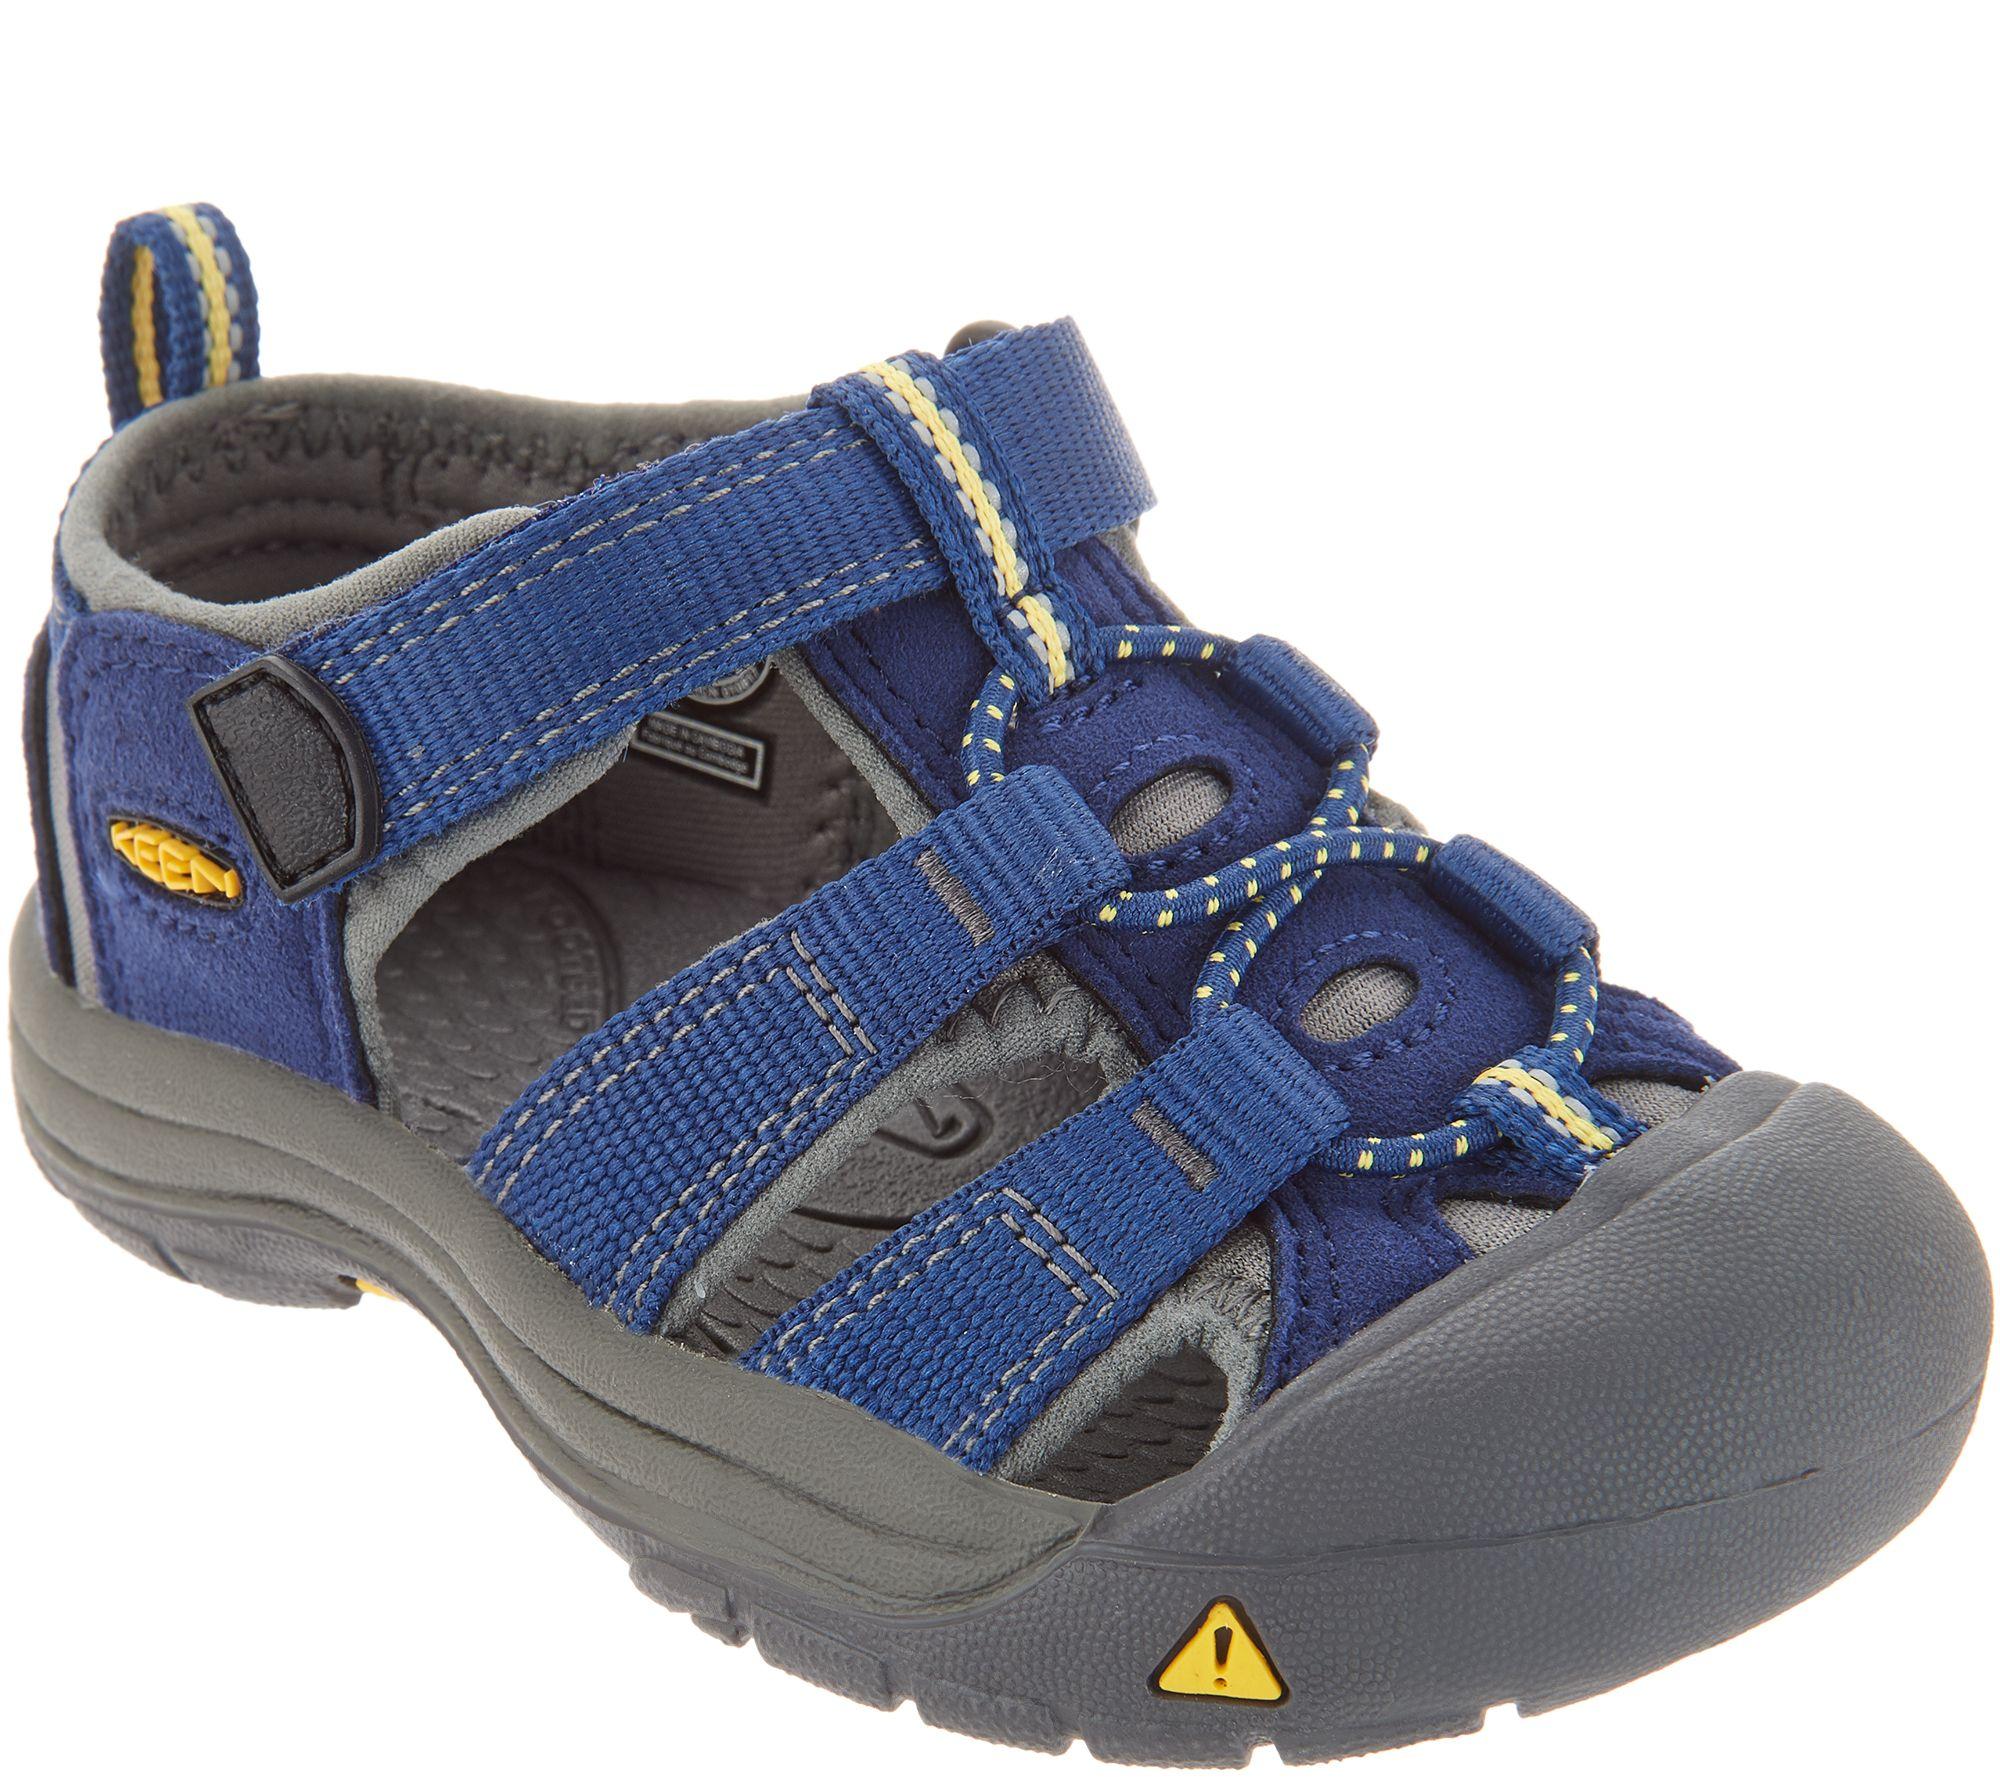 7efa1c55b1b6b KEEN Boys Sport Sandals Newport H2 Toddler — QVC.com